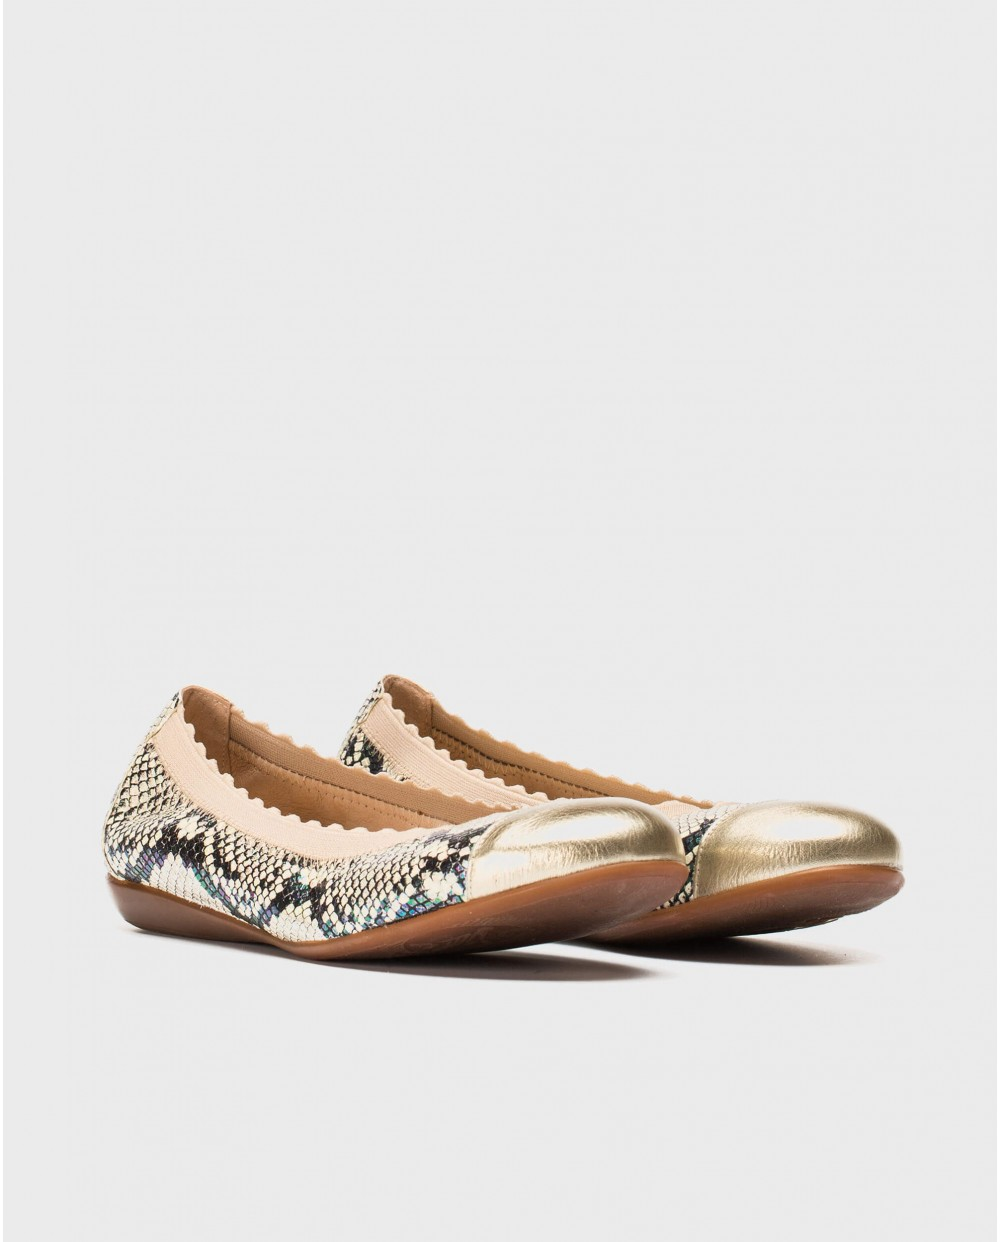 Wonders-Flat Shoes-Ballet pumps with metallic toe cap